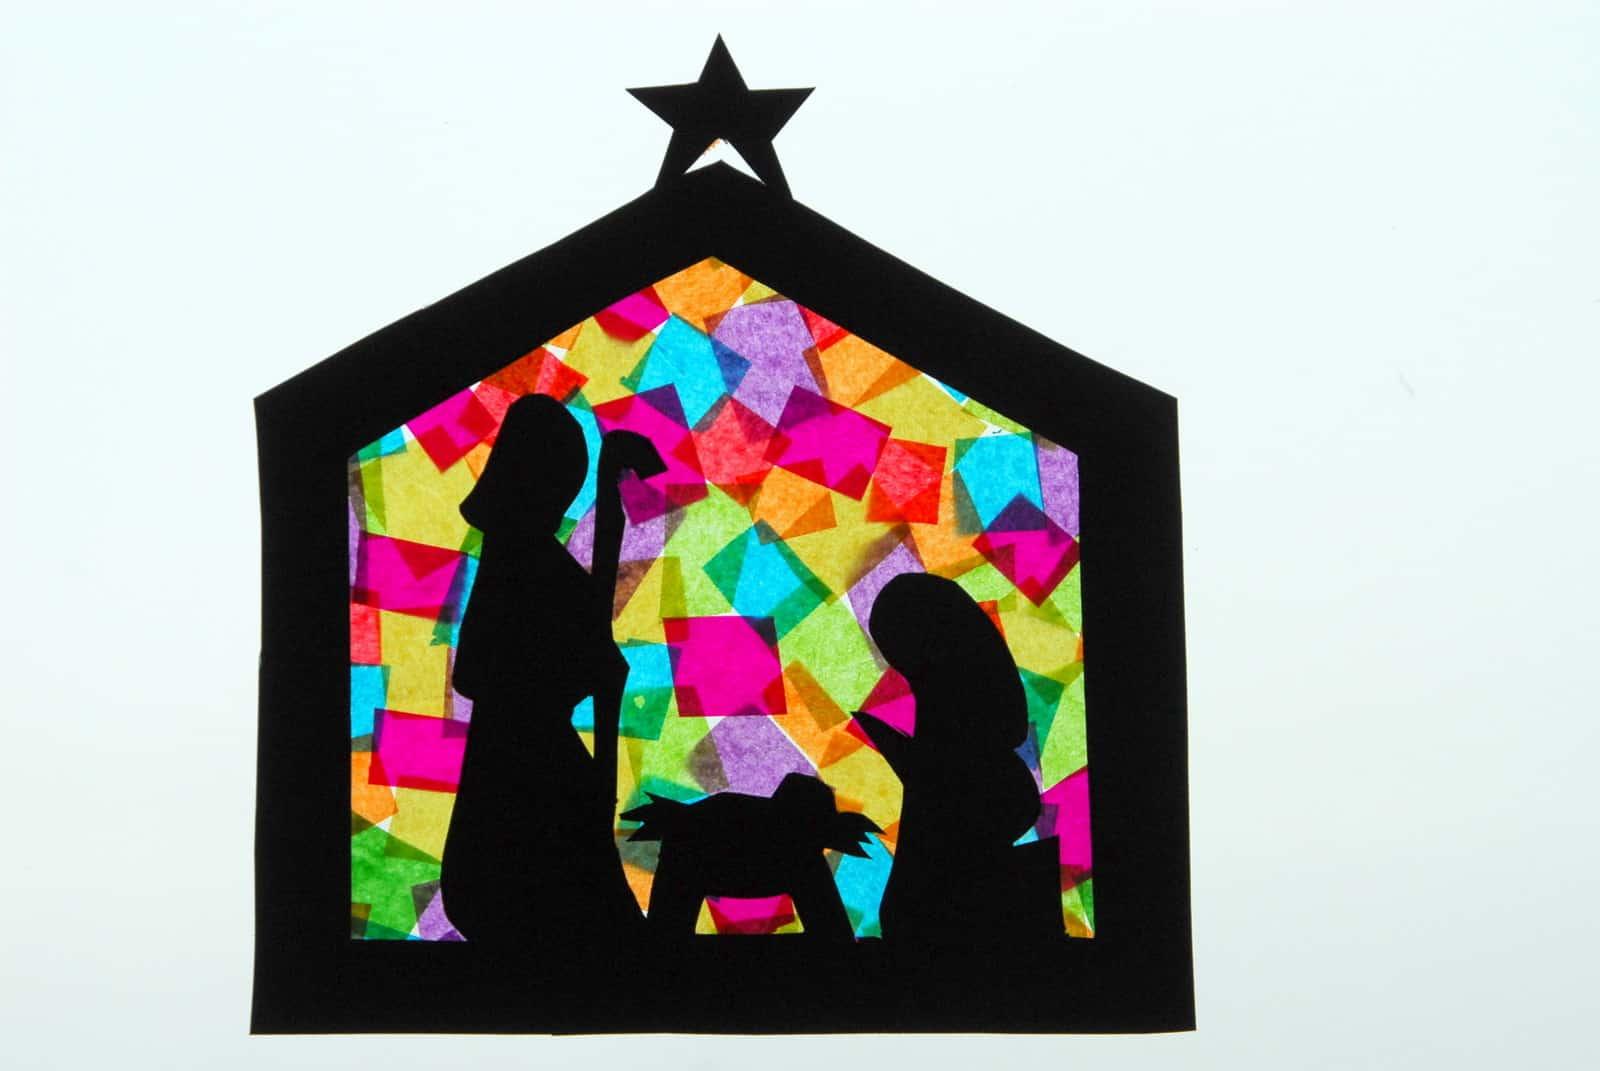 1 Nativitycraft Nativty Stainedglass Christmas Craft